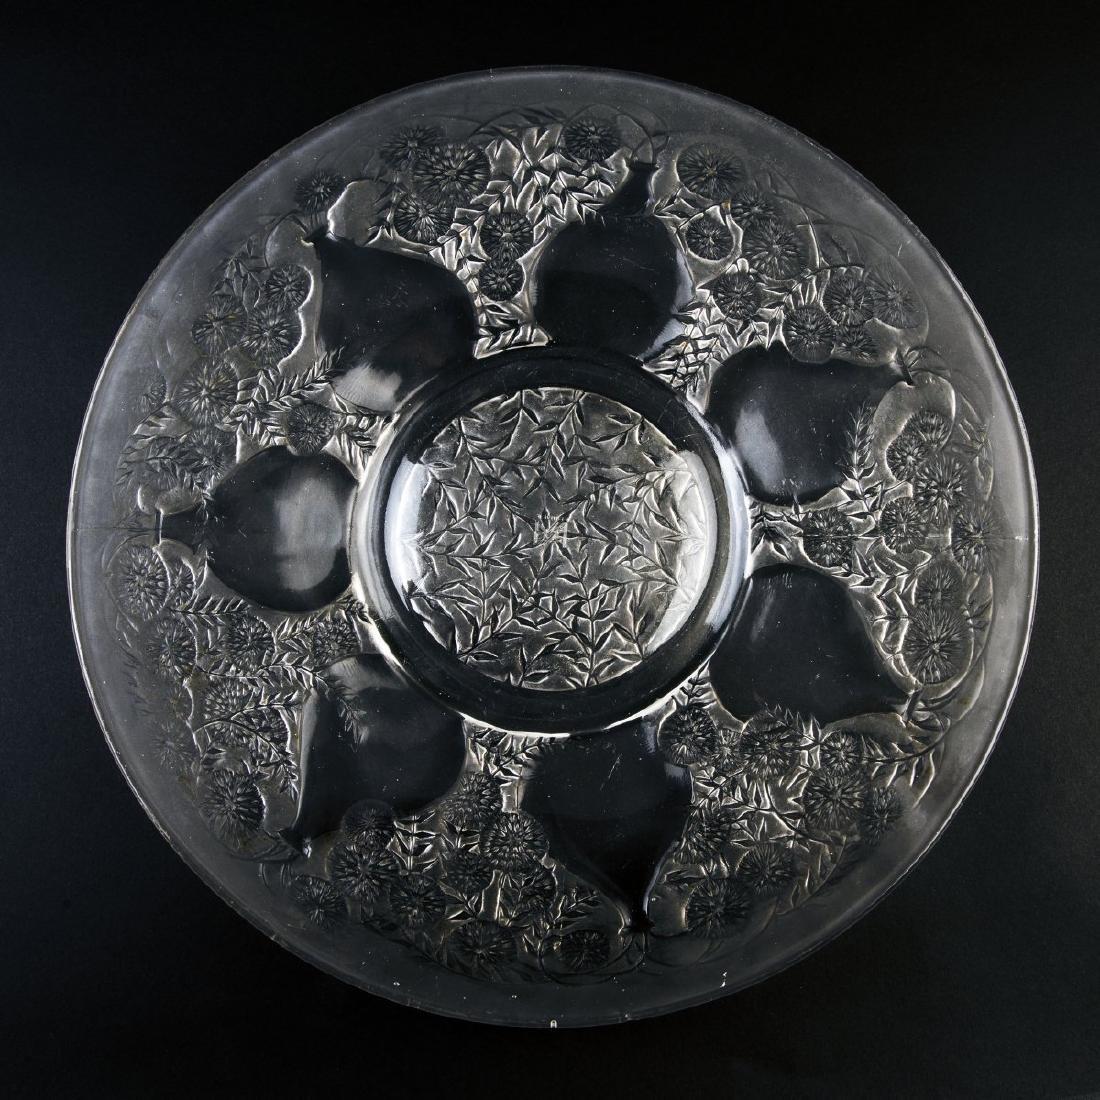 Rene Lalique, 'Vases no.1' plate, 1921